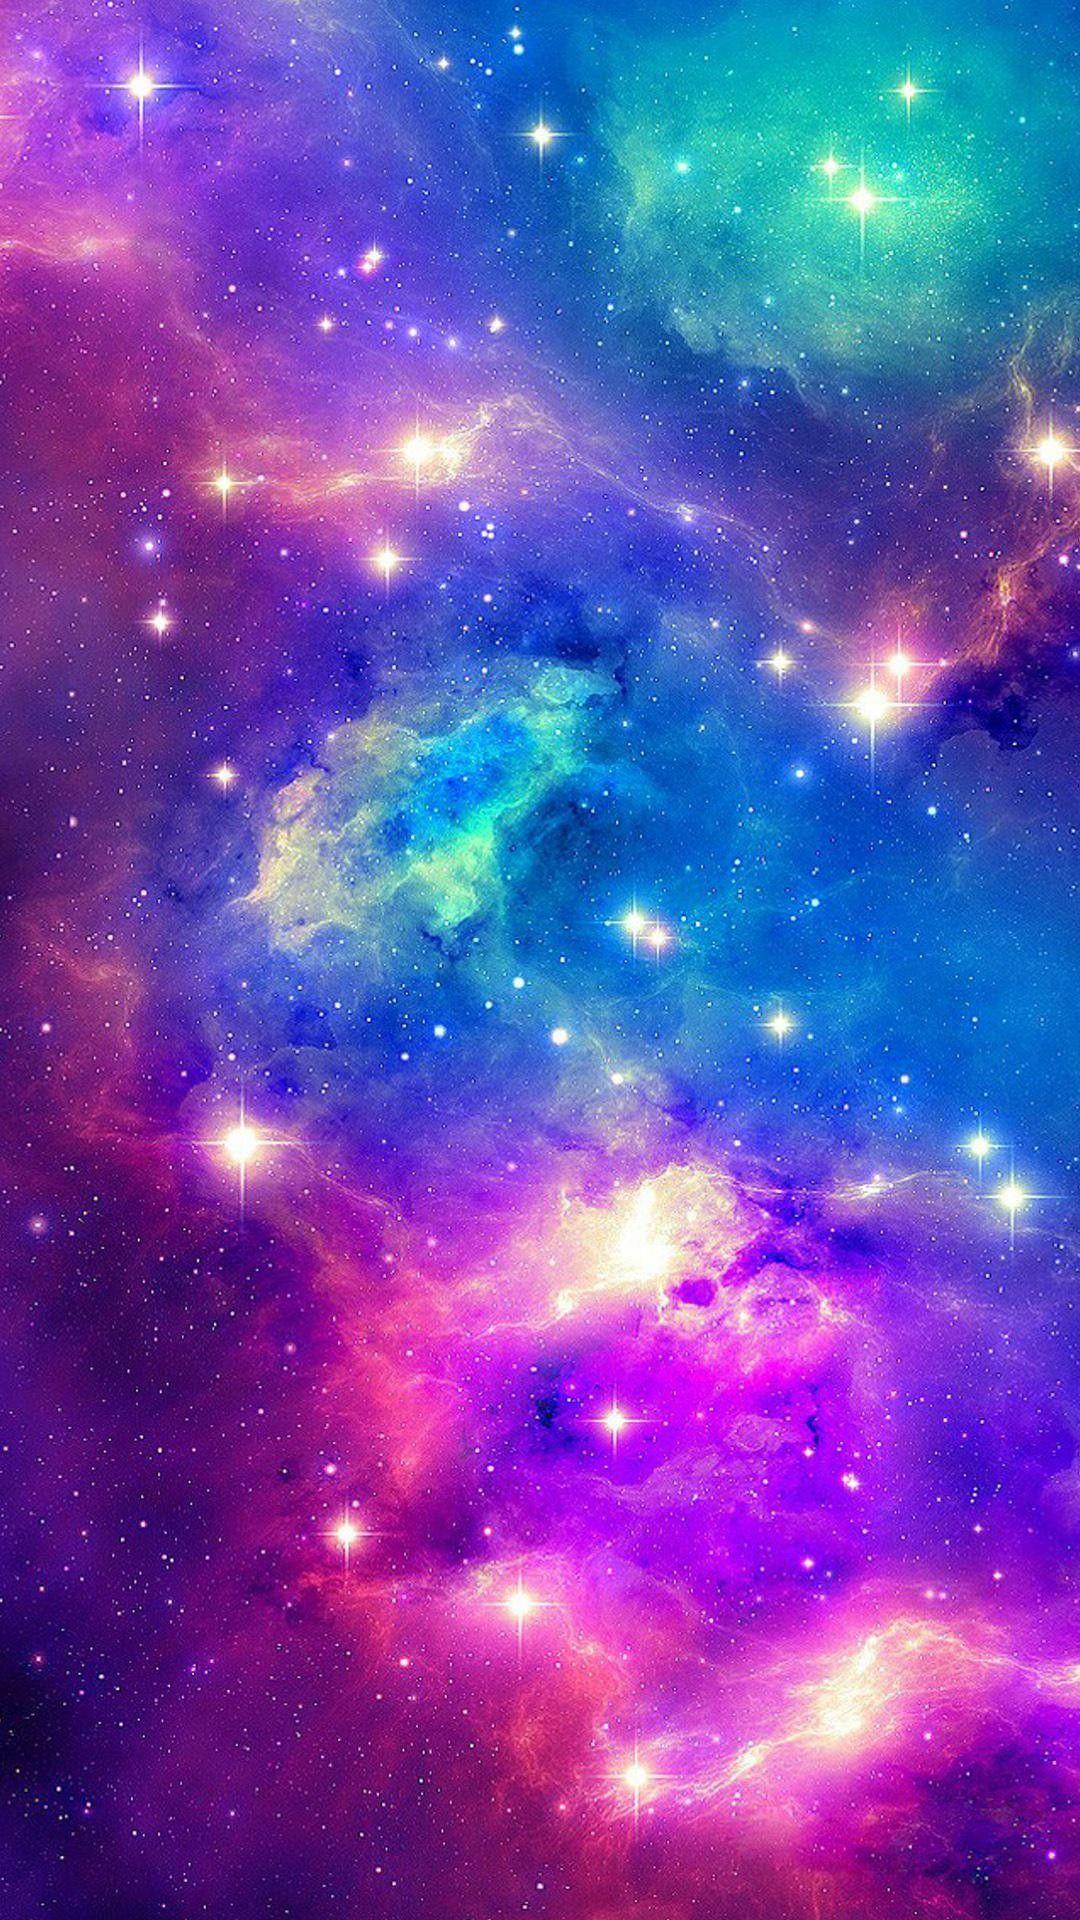 Cute Aesthetic Wallpaper Galaxy Aesthetic Wallpaper In 2020 Pastel Galaxy Galaxy Tumblr Backgrounds Galaxy Wallpaper